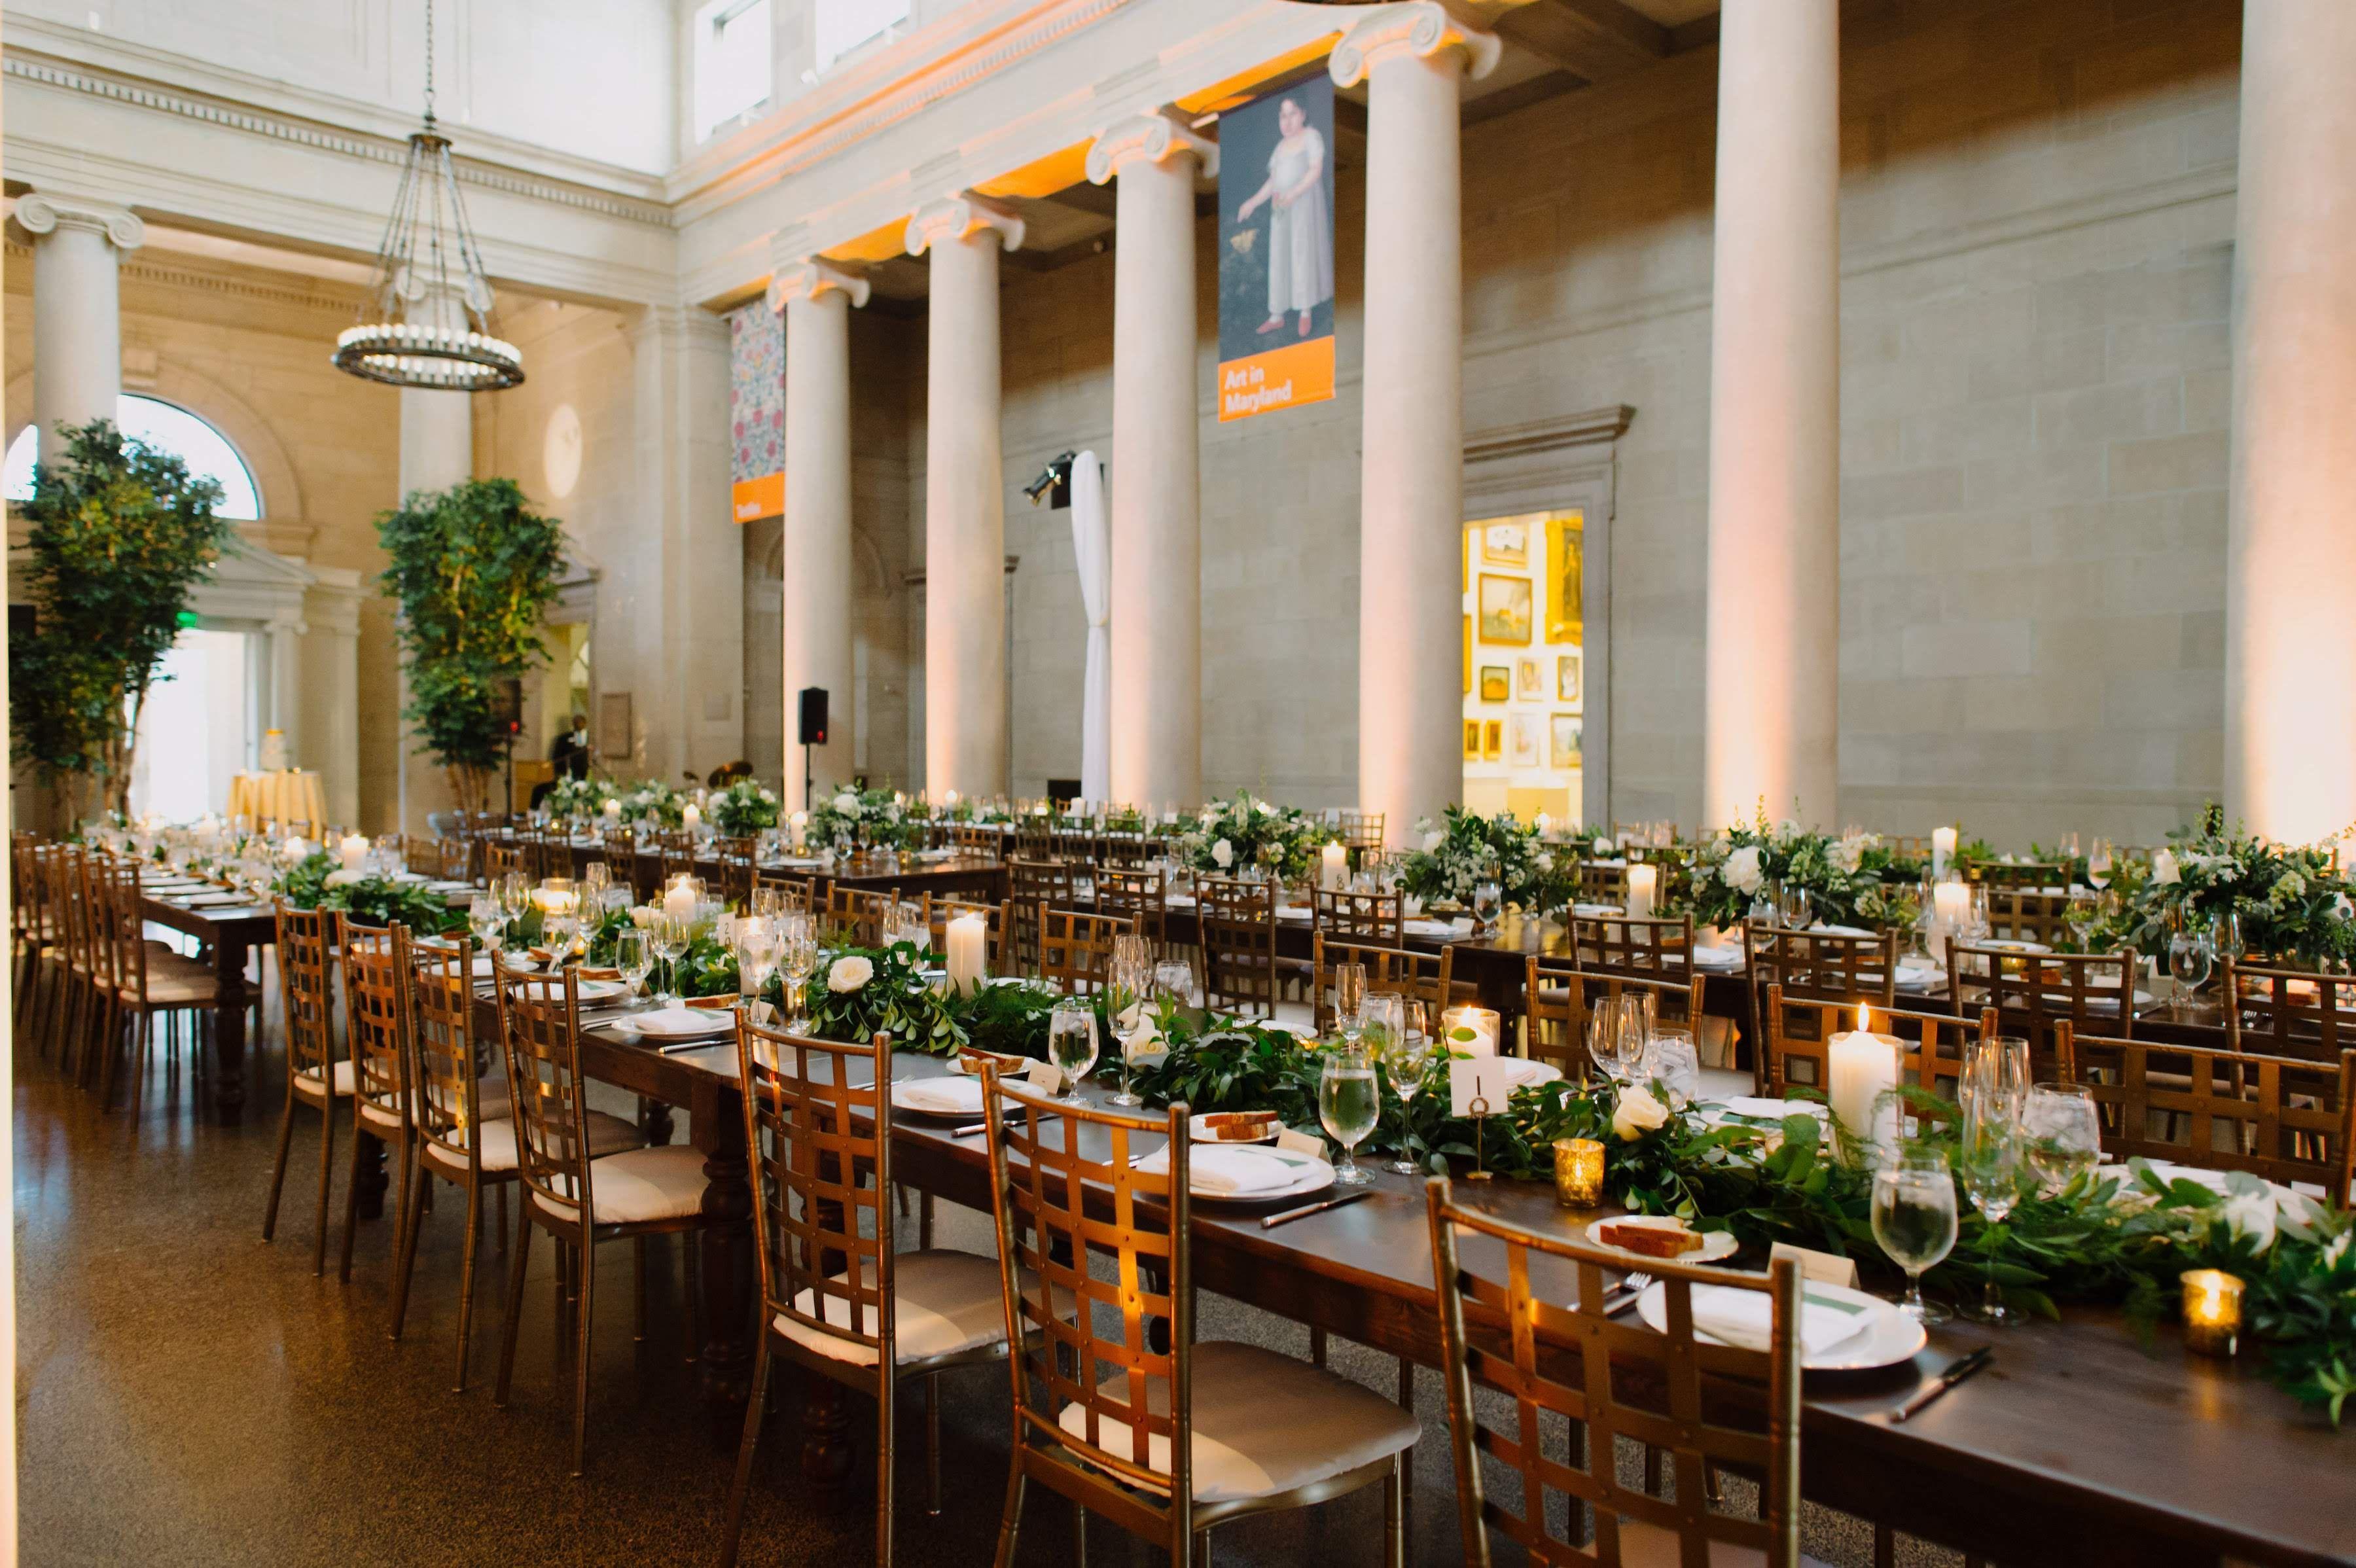 Baltimore Wedding Venue In 2020 Baltimore Wedding Venue Baltimore Wedding Wedding Venues